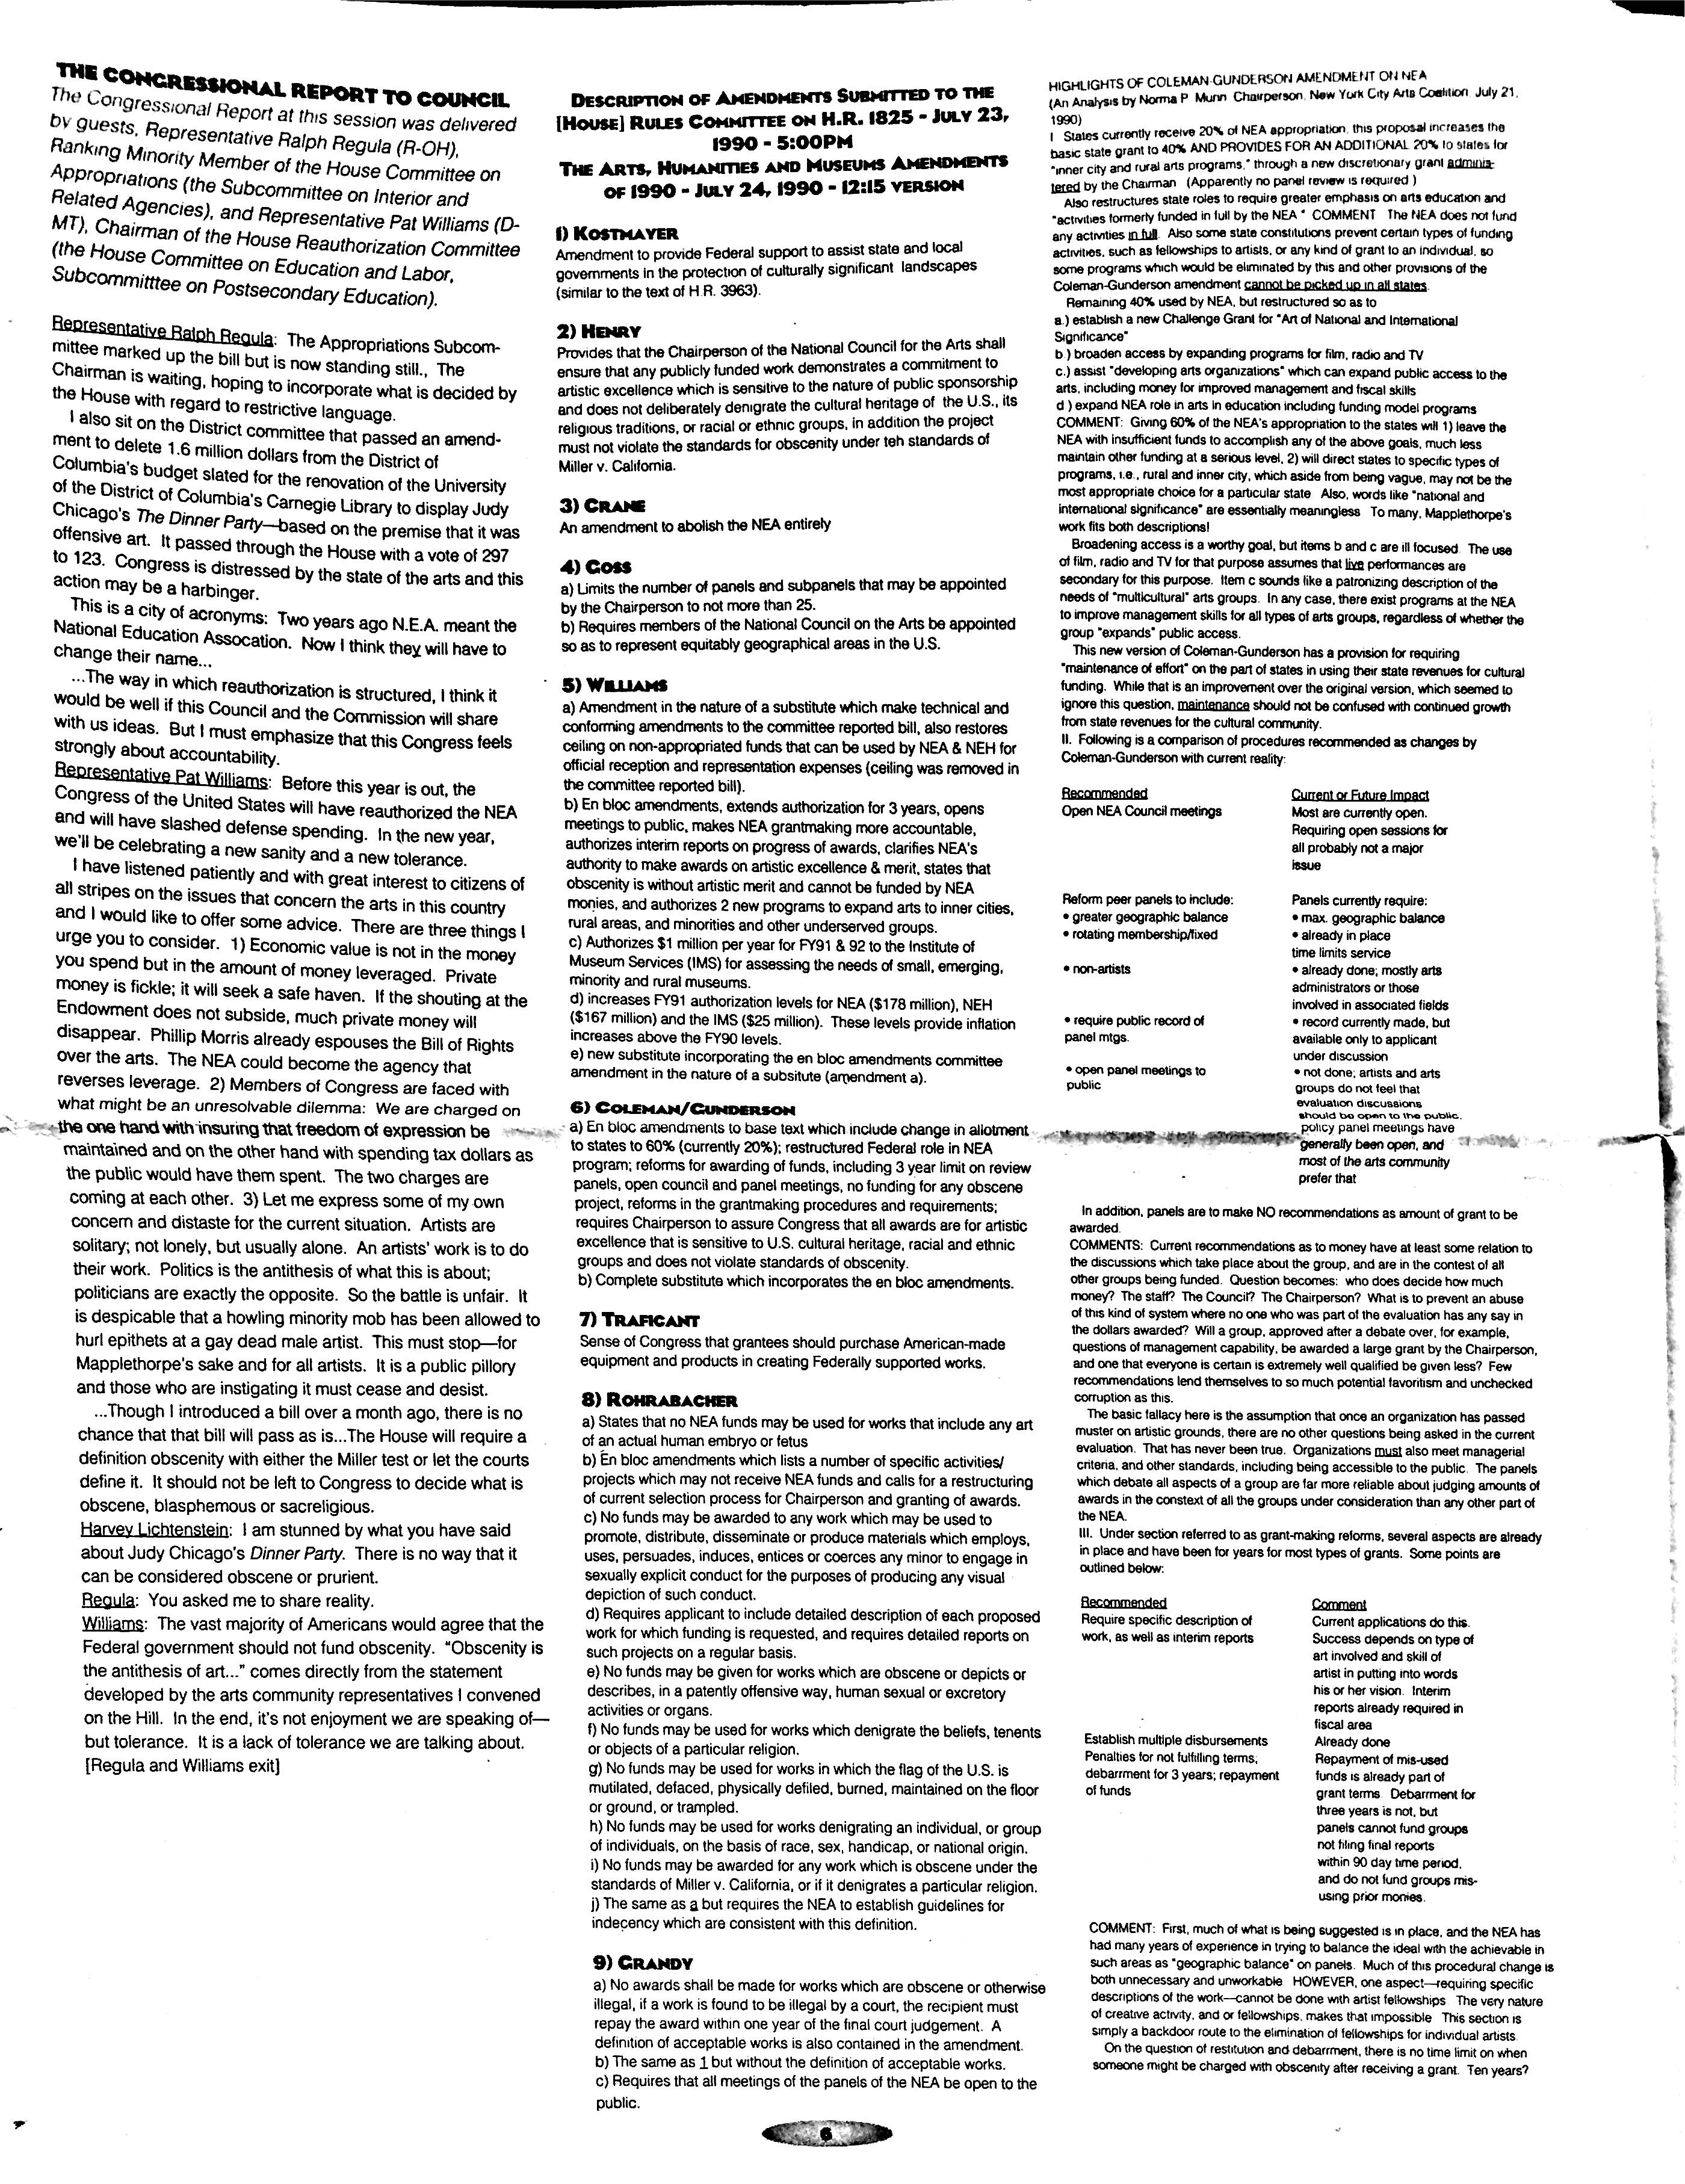 Summer 1990 - NAAO Bulletin Page 6.jpg